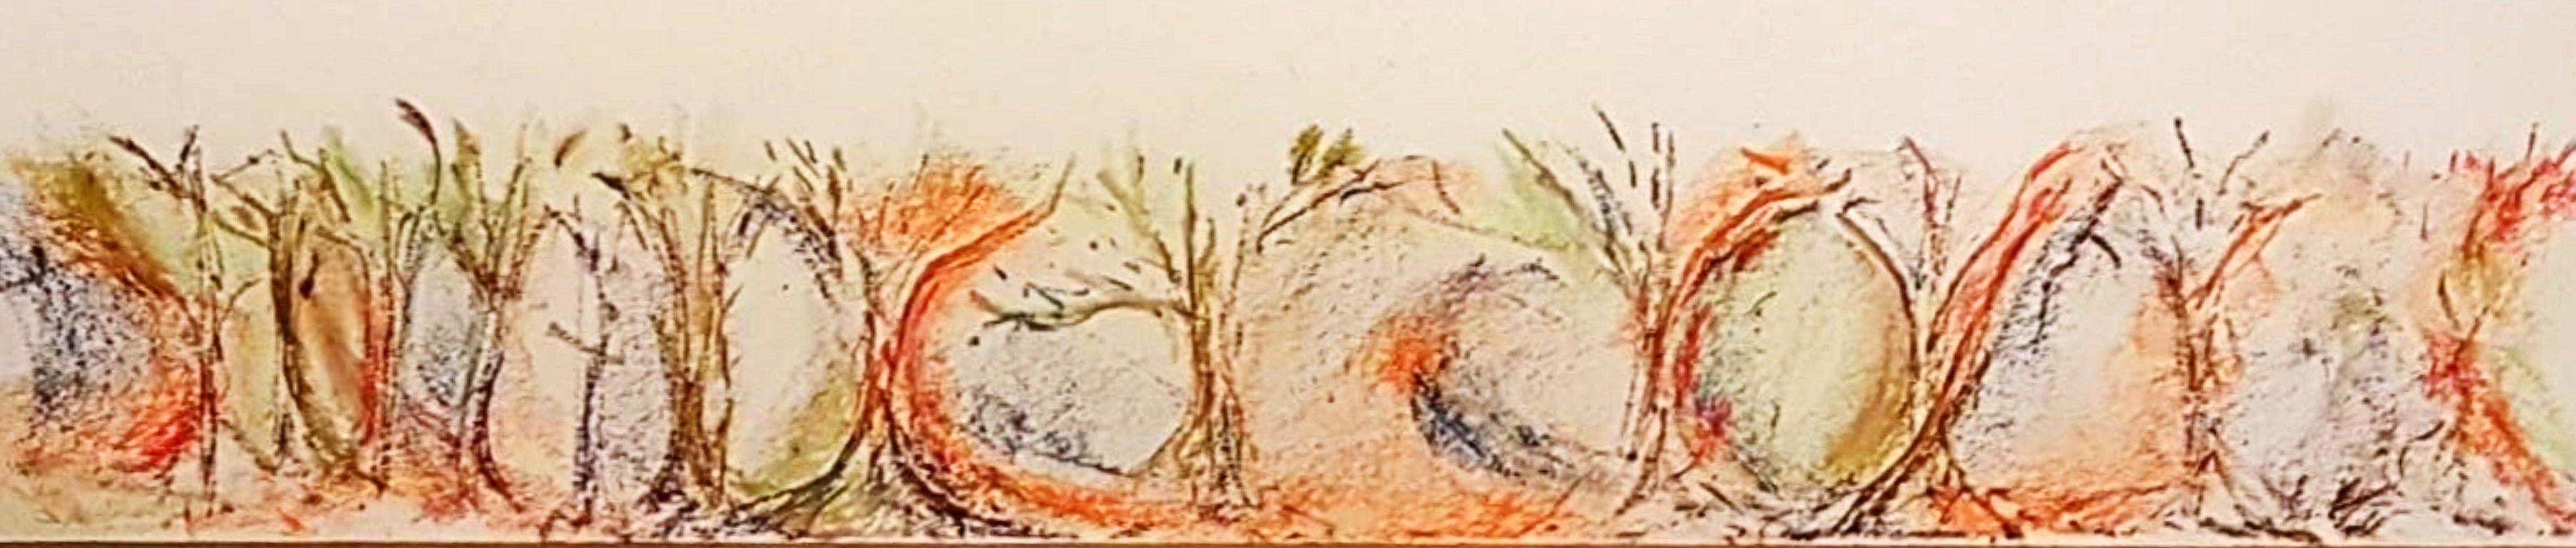 181112 header tanzende Bäume ohne uns